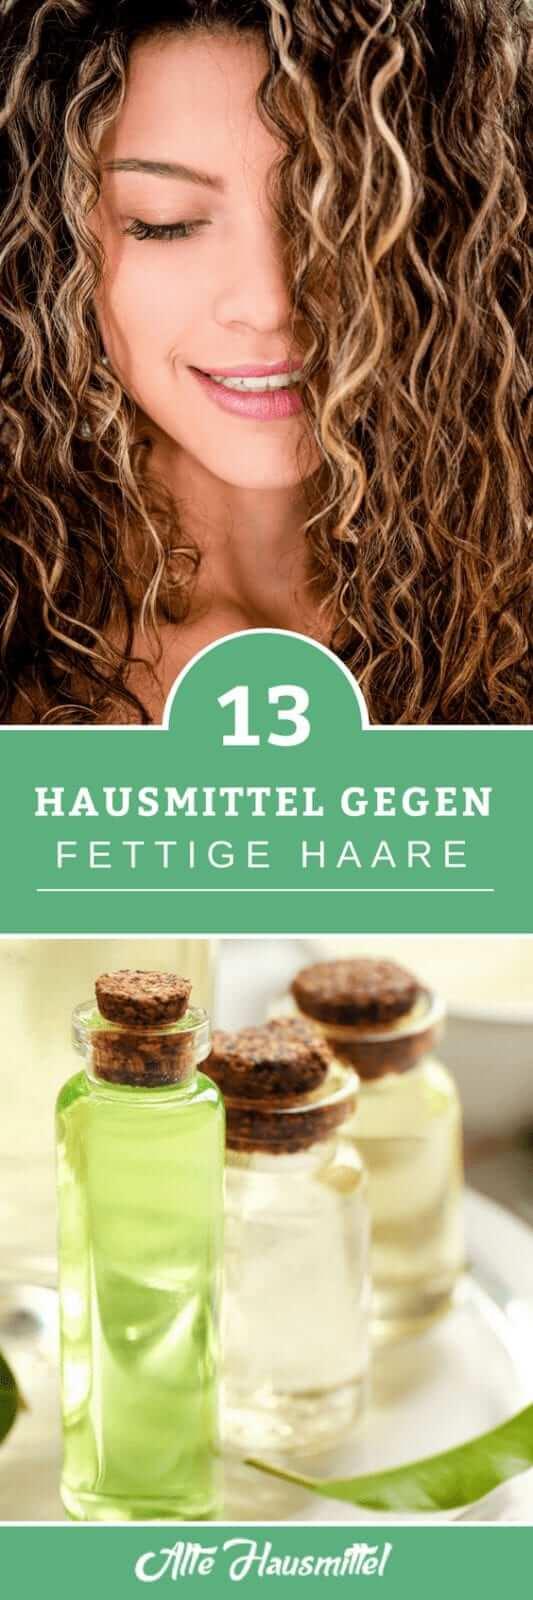 13 Hausmittel gegen fettige Haare